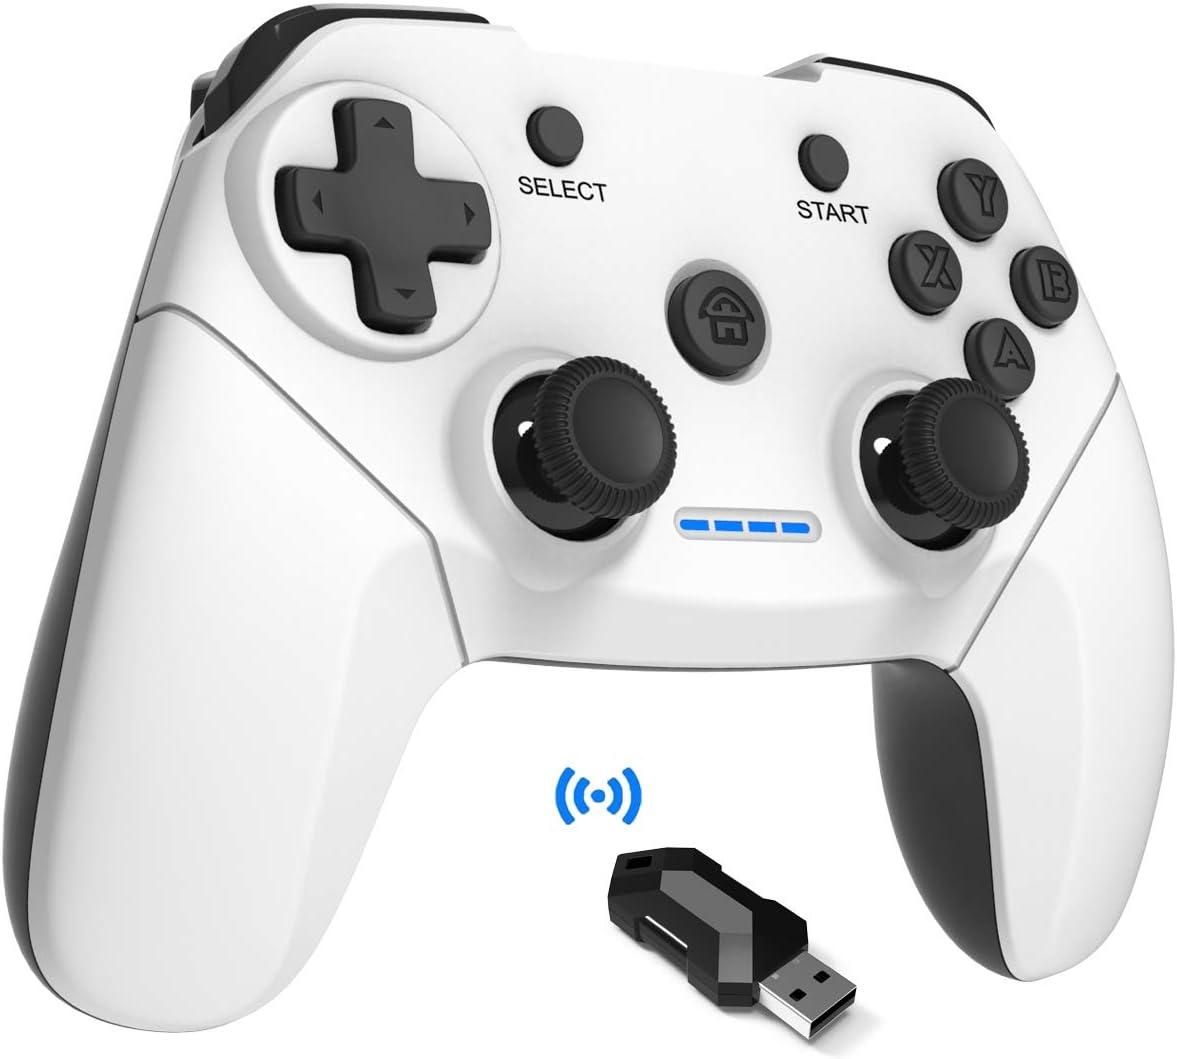 Maegoo Mando PC PS3 Inalámbrico,2.4G Wireless Game Mando Gamepad Joystick con Dual Shock Recargable para Playstation 3 y PC Windows 10 XP 7 8 Smart ...